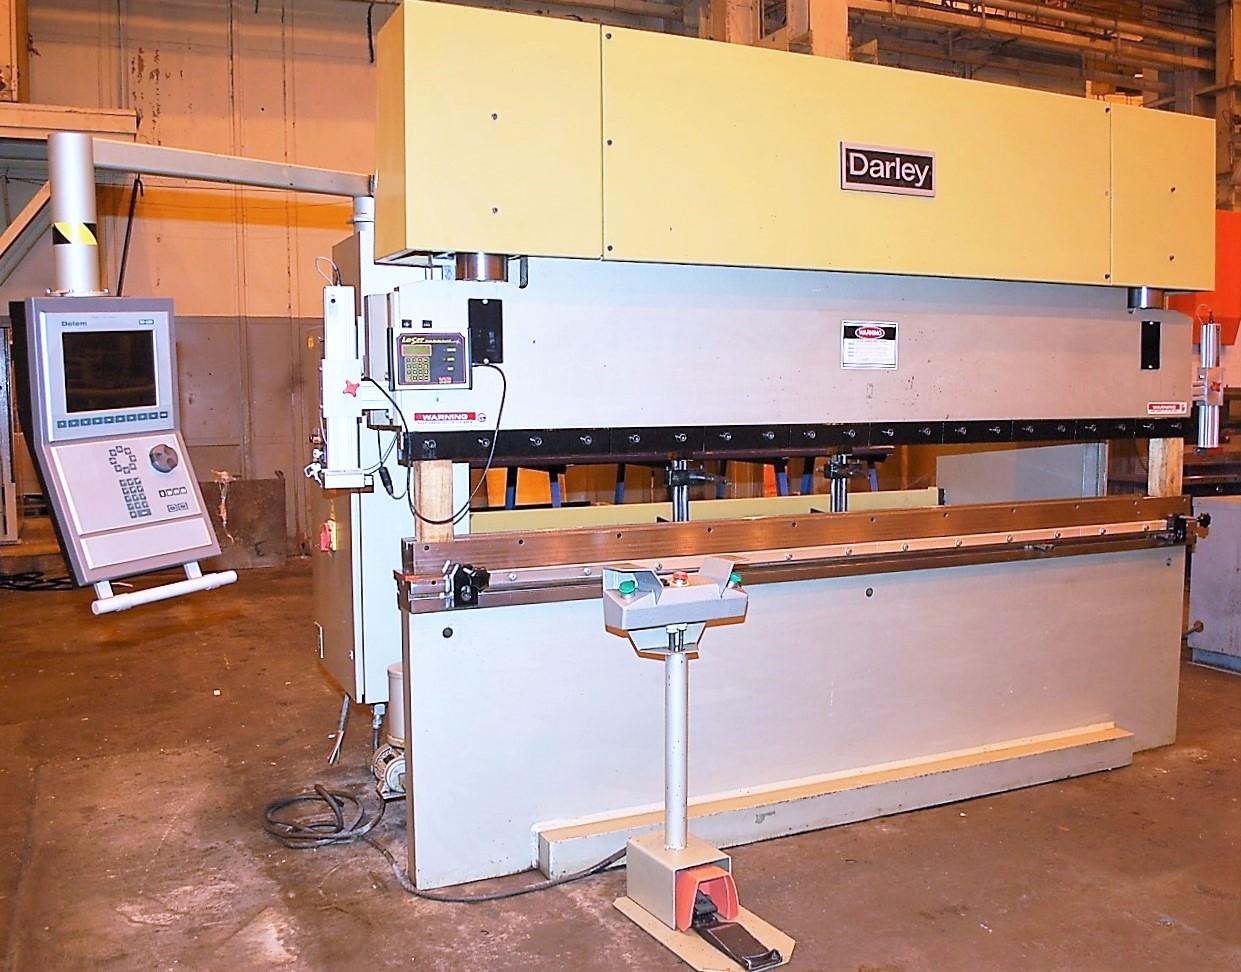 "DARLEY EHP 110 31/25, 110 Ton, 120"" OA, 100"" BH, 2-Axis B.G, Delem DA65R Retrofit 2015, #30396"